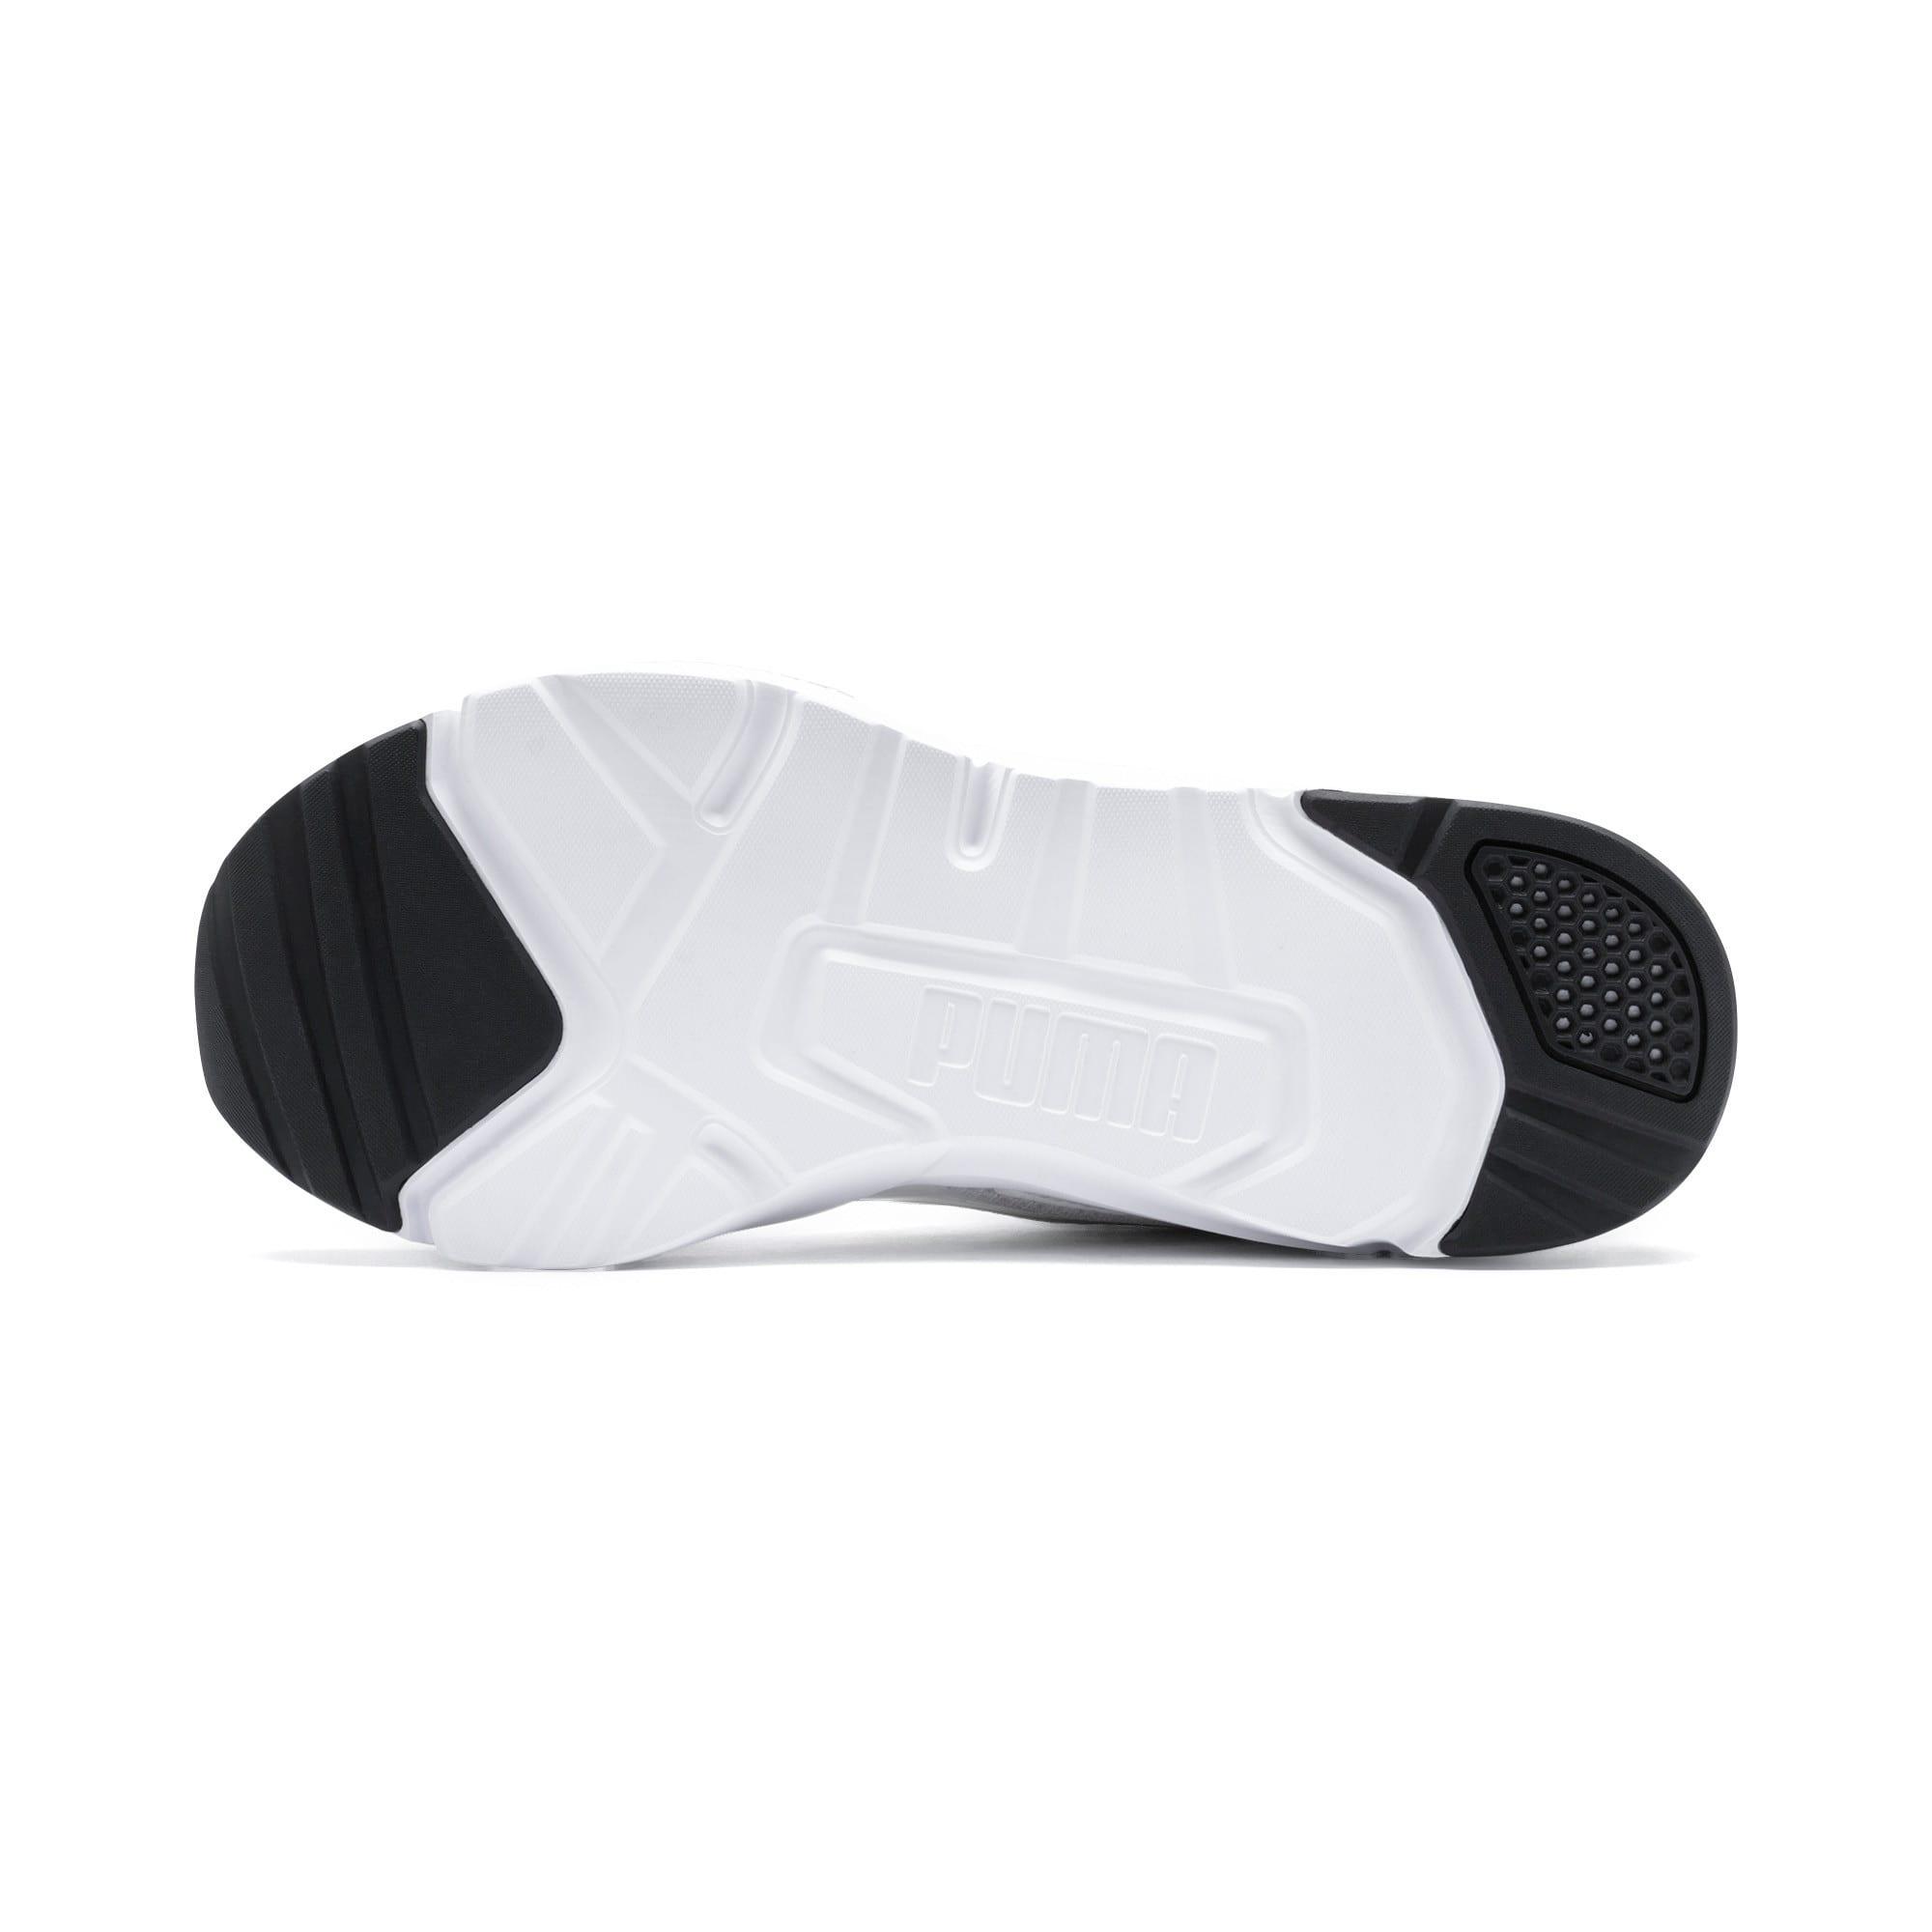 Thumbnail 5 of CELL Phase Lights Men's Running Shoes, Puma White-Gray Violet, medium